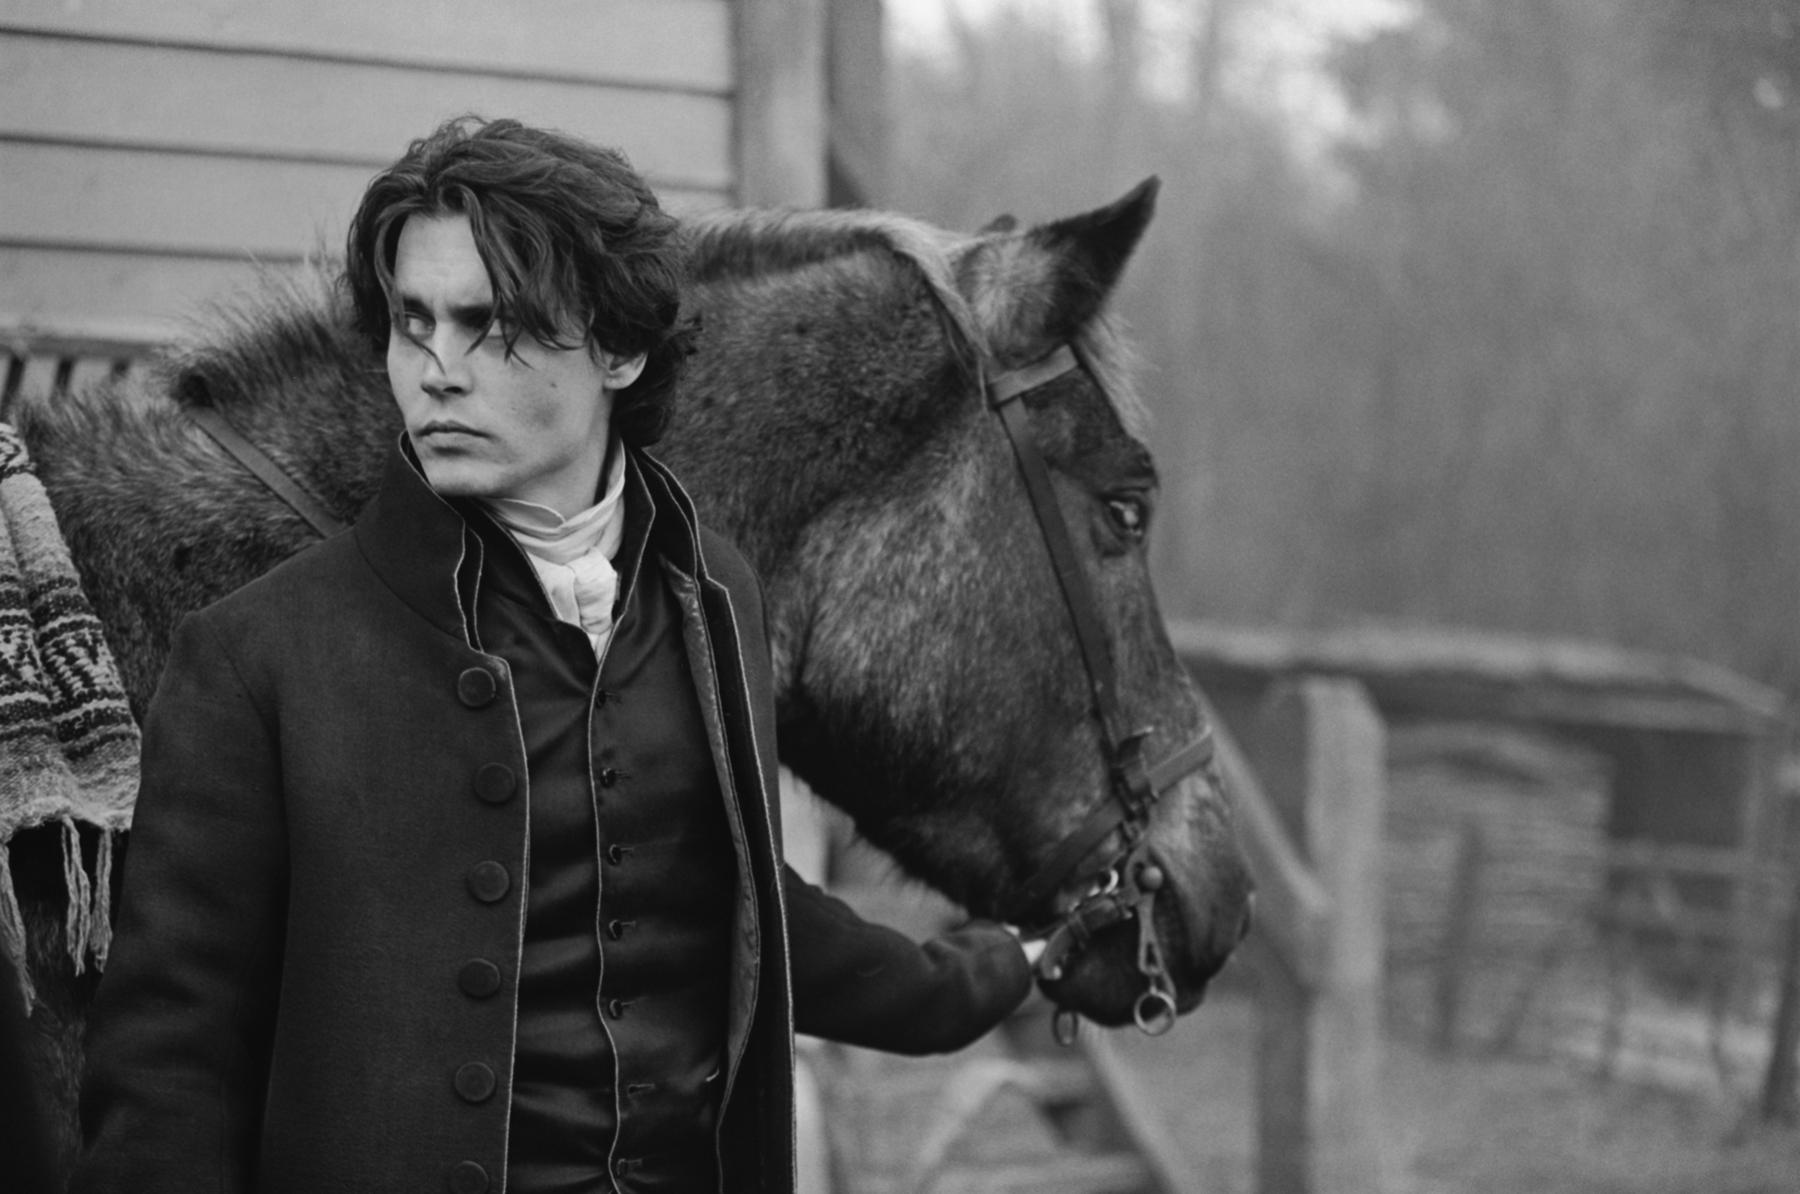 Johnny Depp on location, Sleepy Hollow, England, 1999